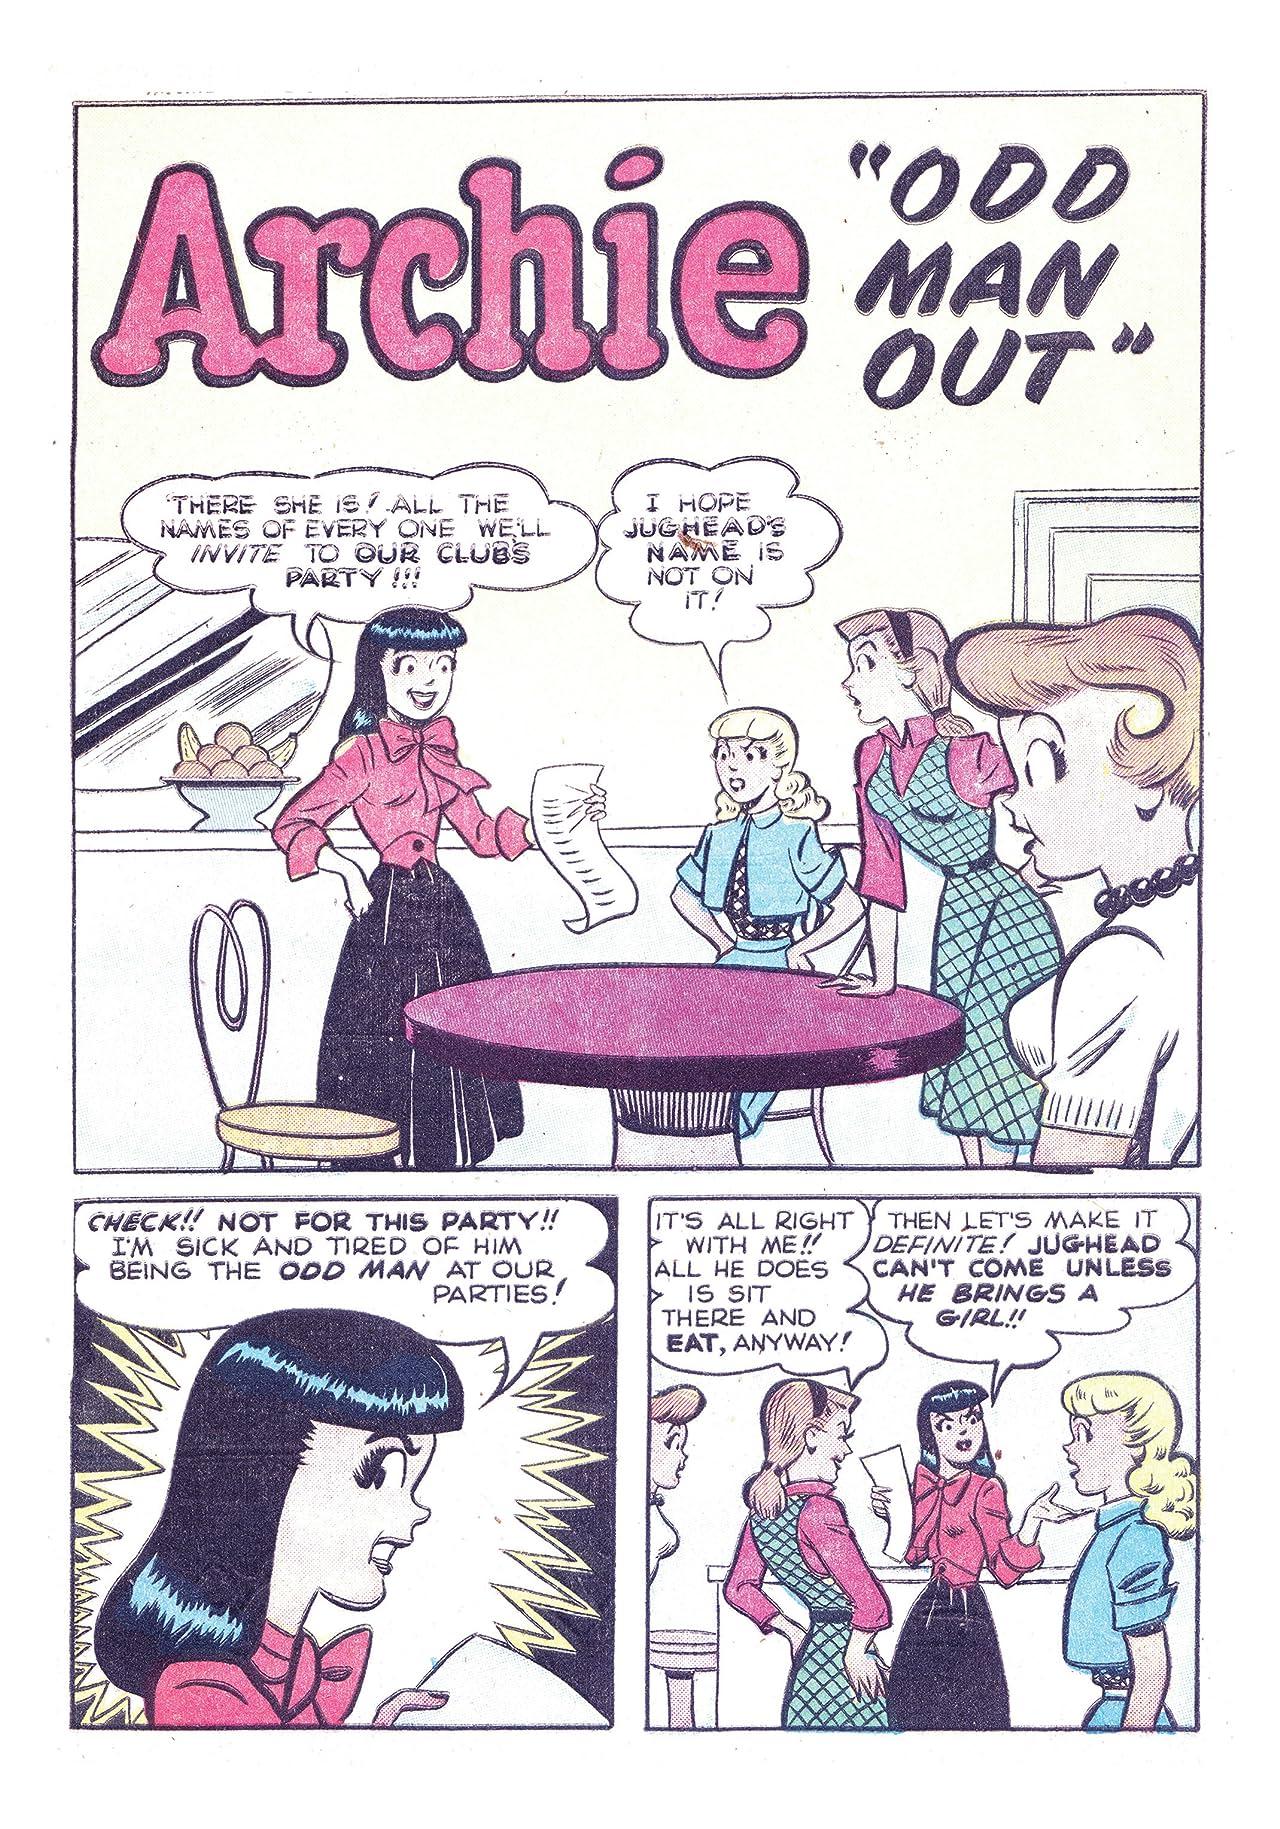 Archie #52